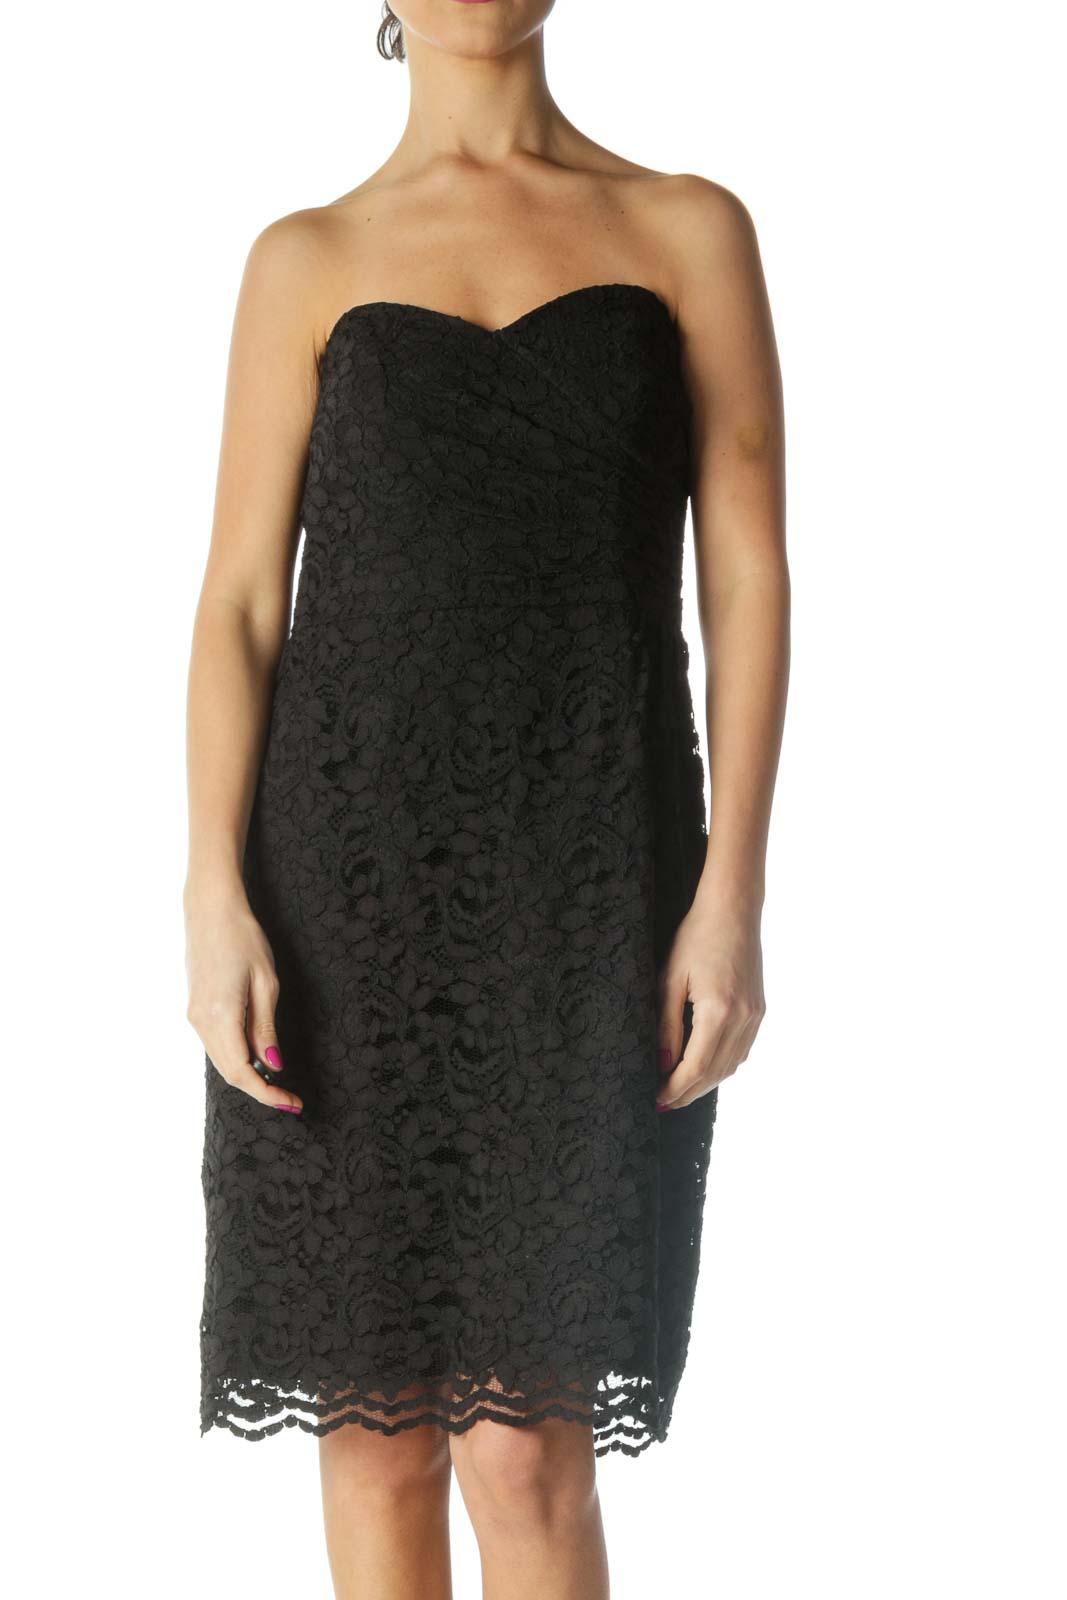 Black Lace Chic Sheath Dress Front